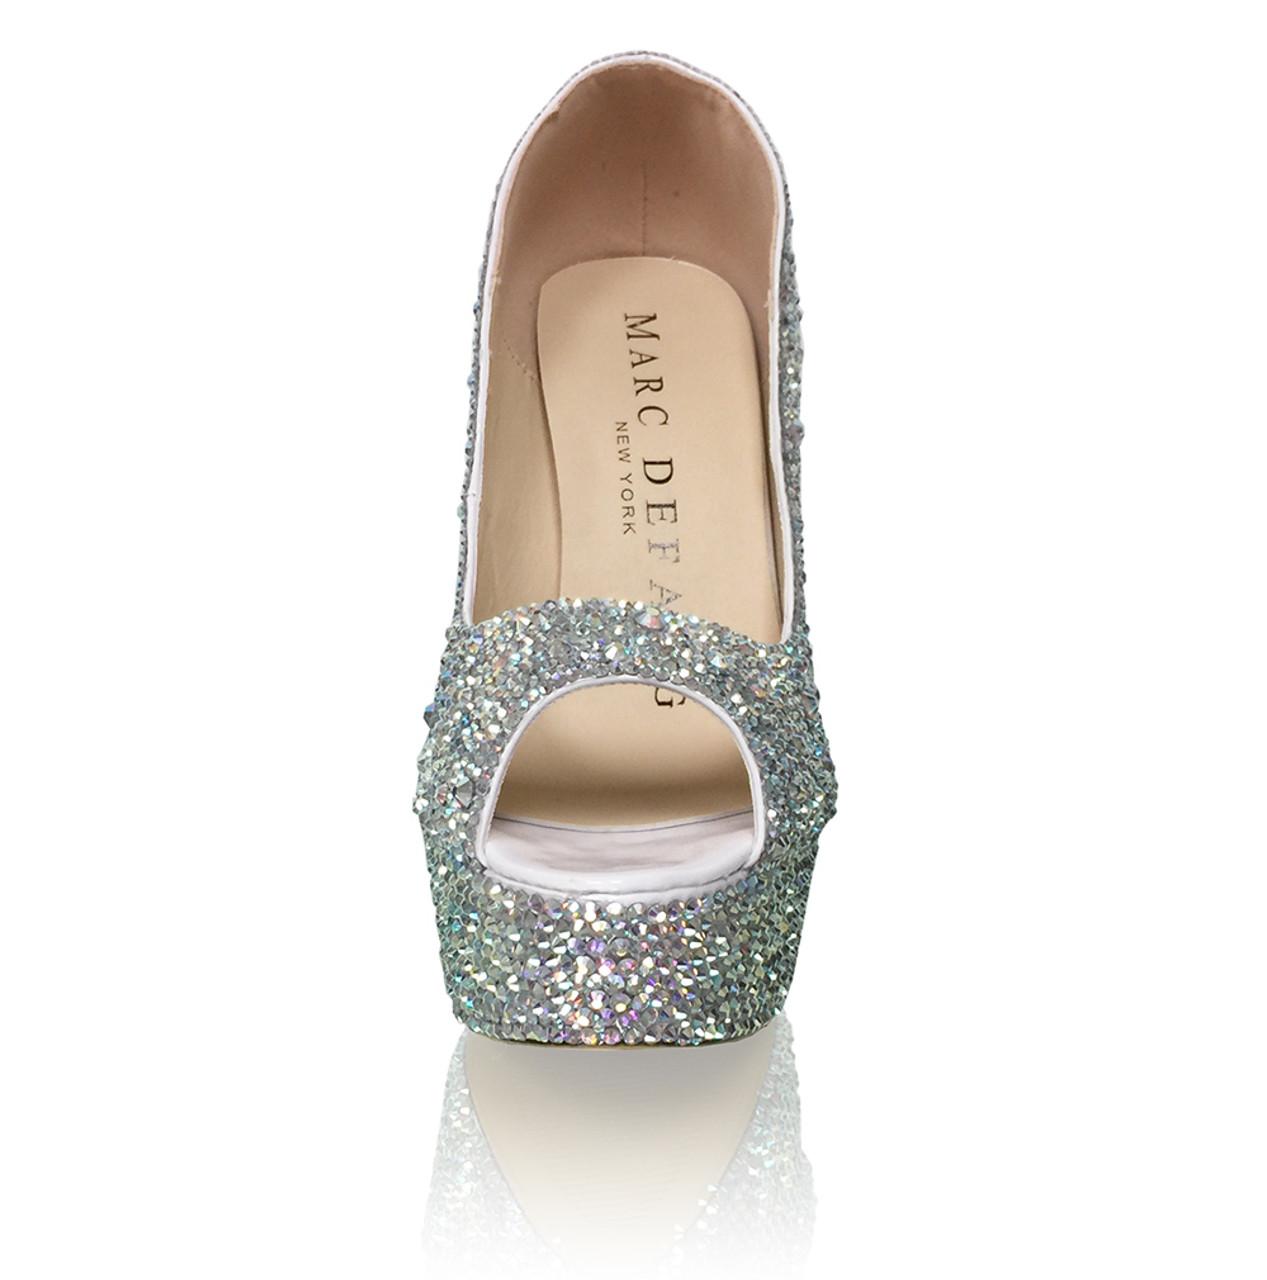 "6"" Peep Toes 2-5mm Mixed Crystal Platform High Heels"